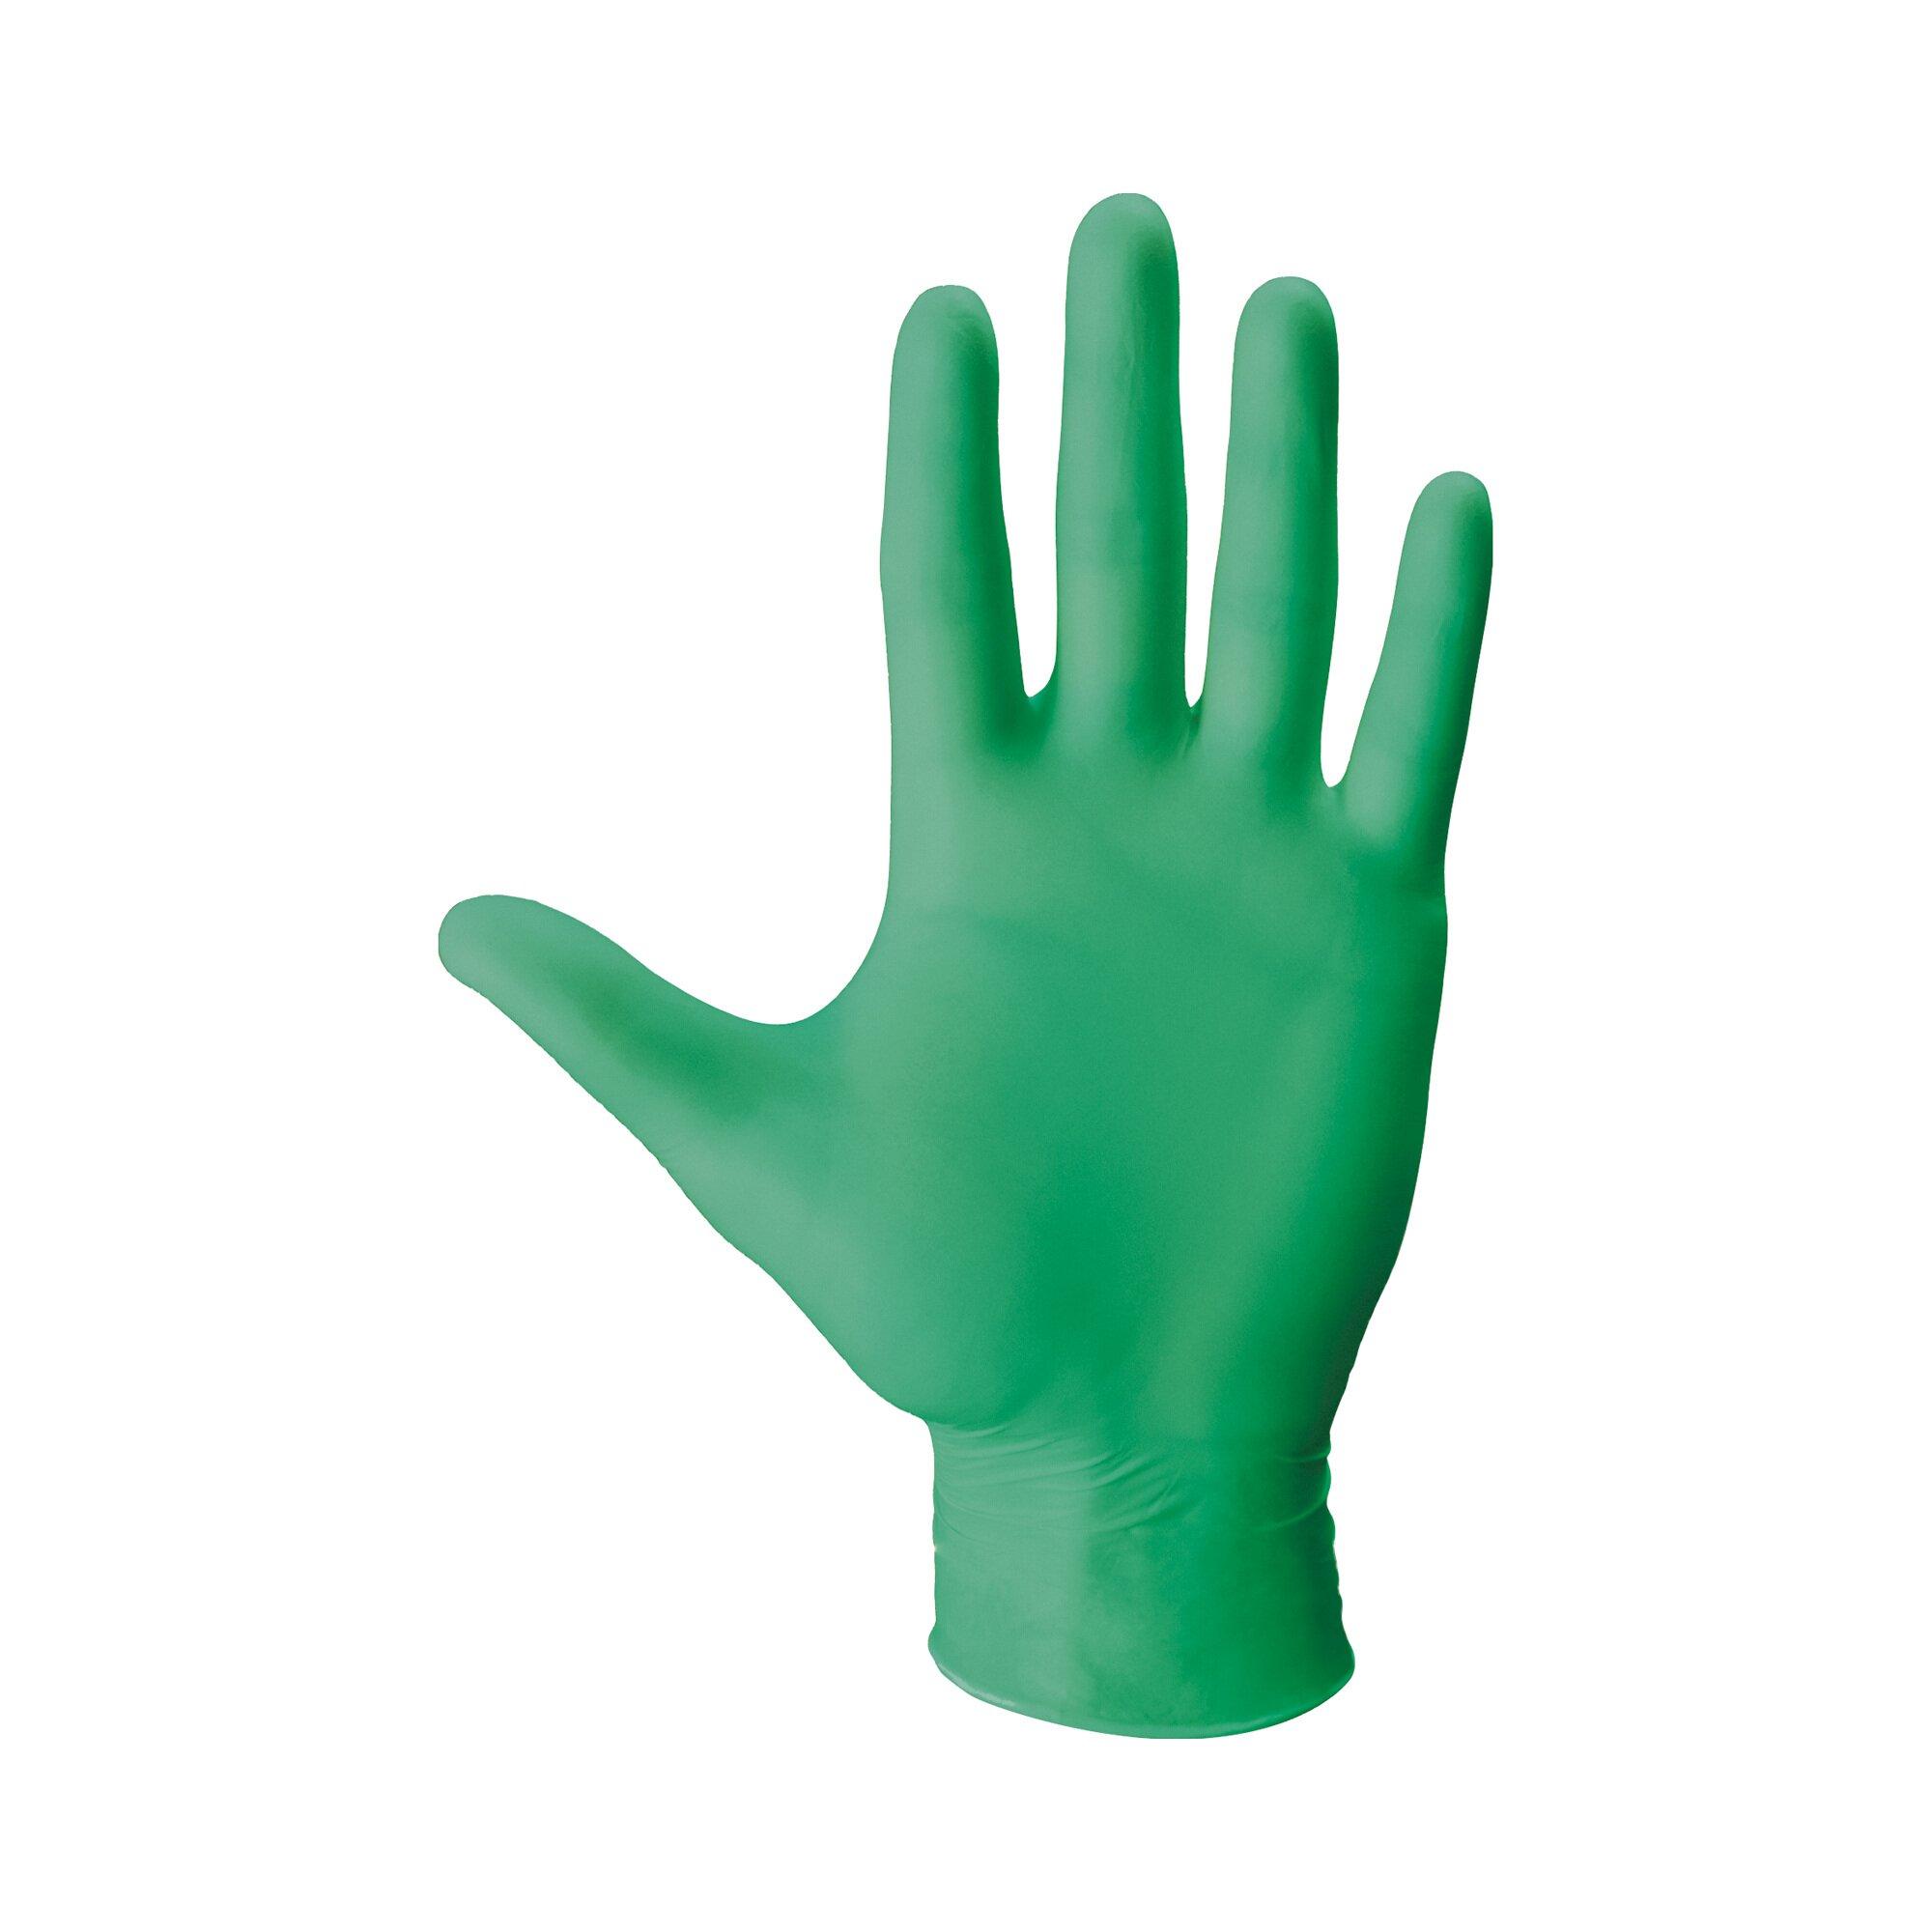 Image of Aloe Vera Handschuhe, 100 Stück, Größe: L